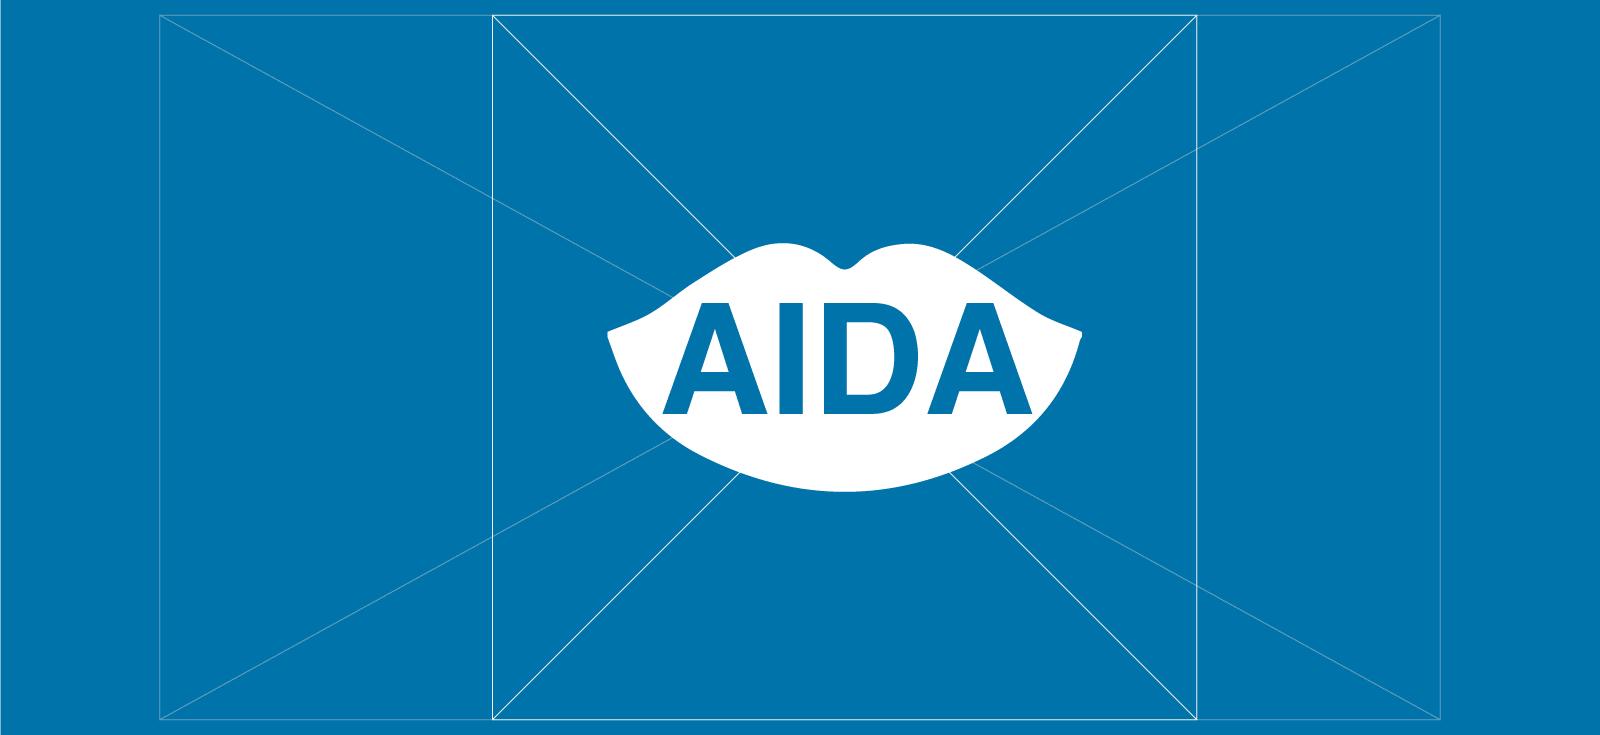 AIDA: Attention, Interest, Desire, Action